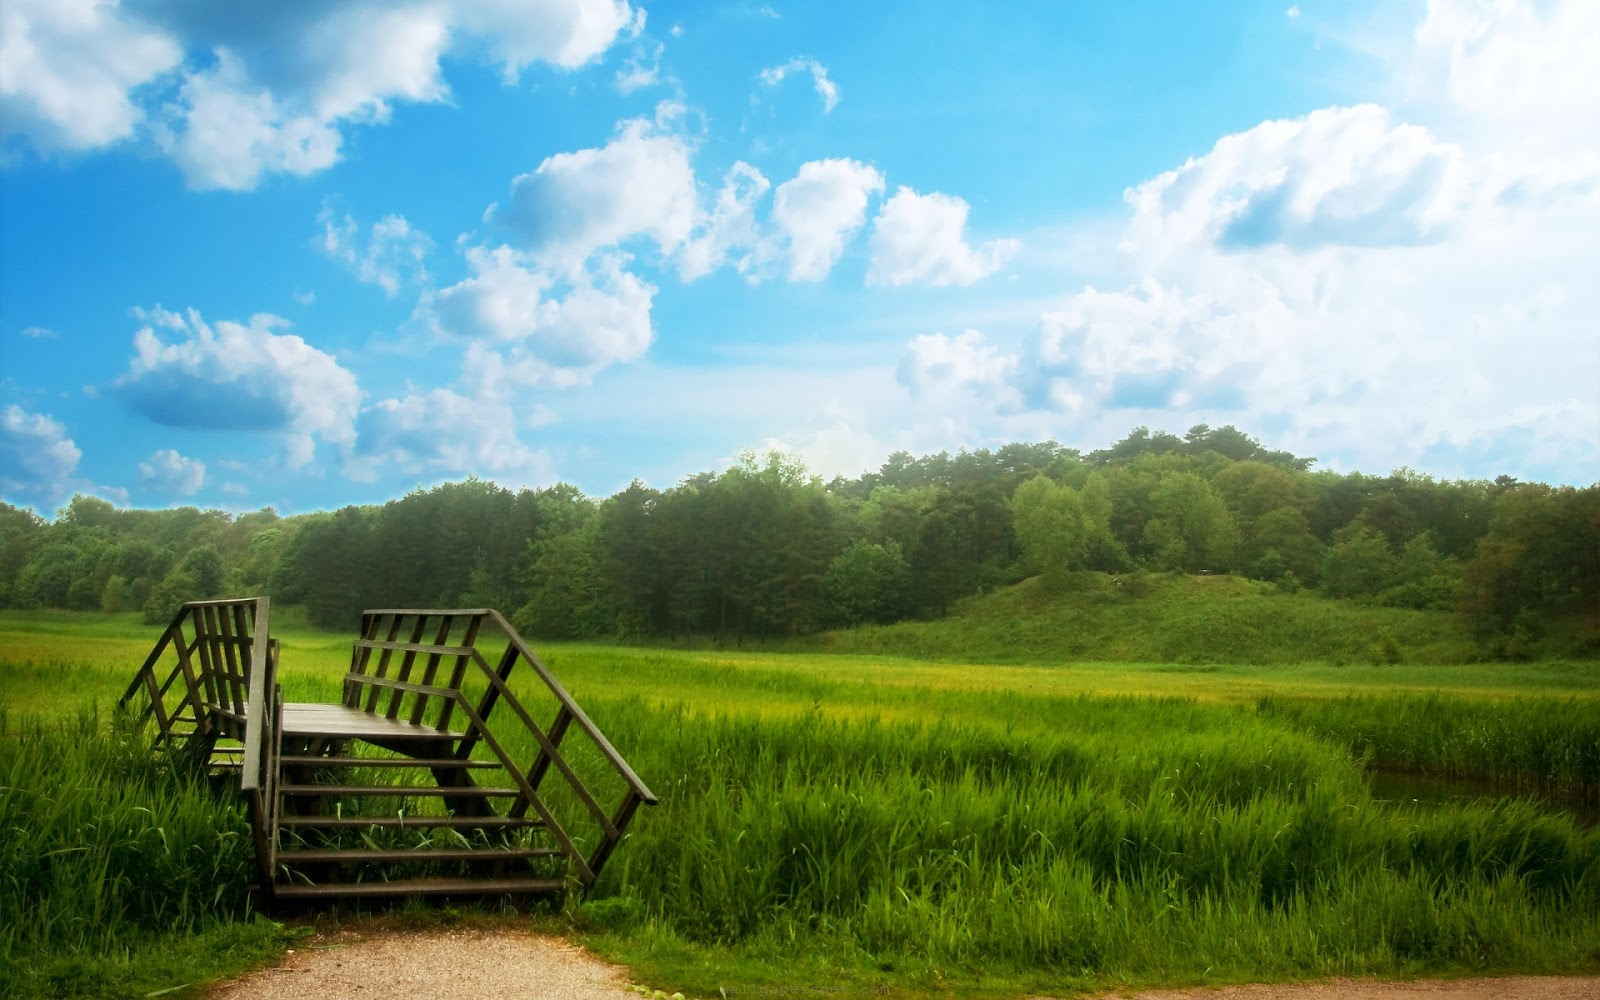 pemandangan kampung, sawah padi kampung, gambar orang kampung